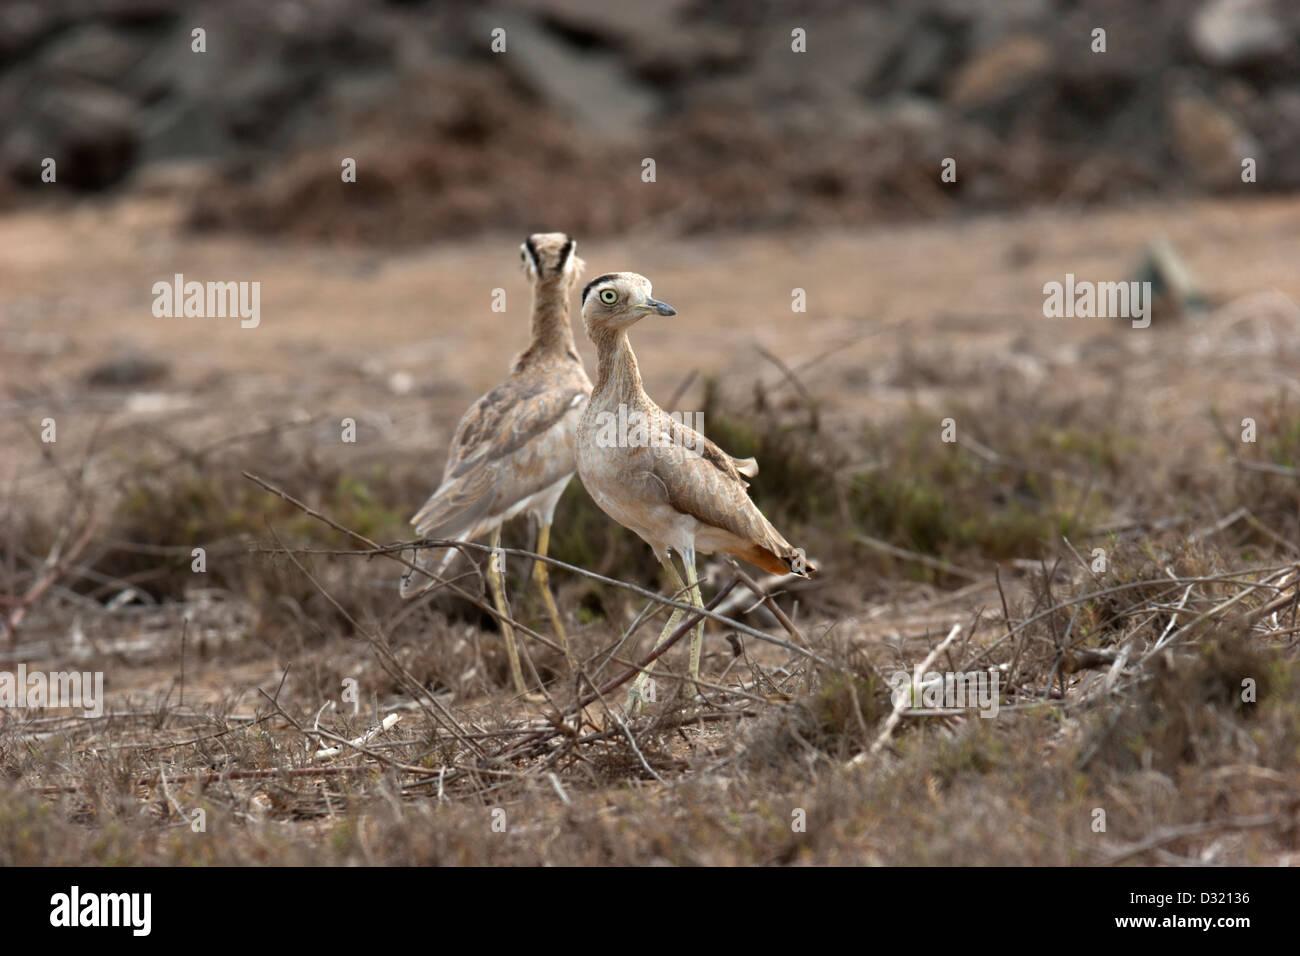 Bird Uganda marrone uccelli nidificanti di massa Immagini Stock